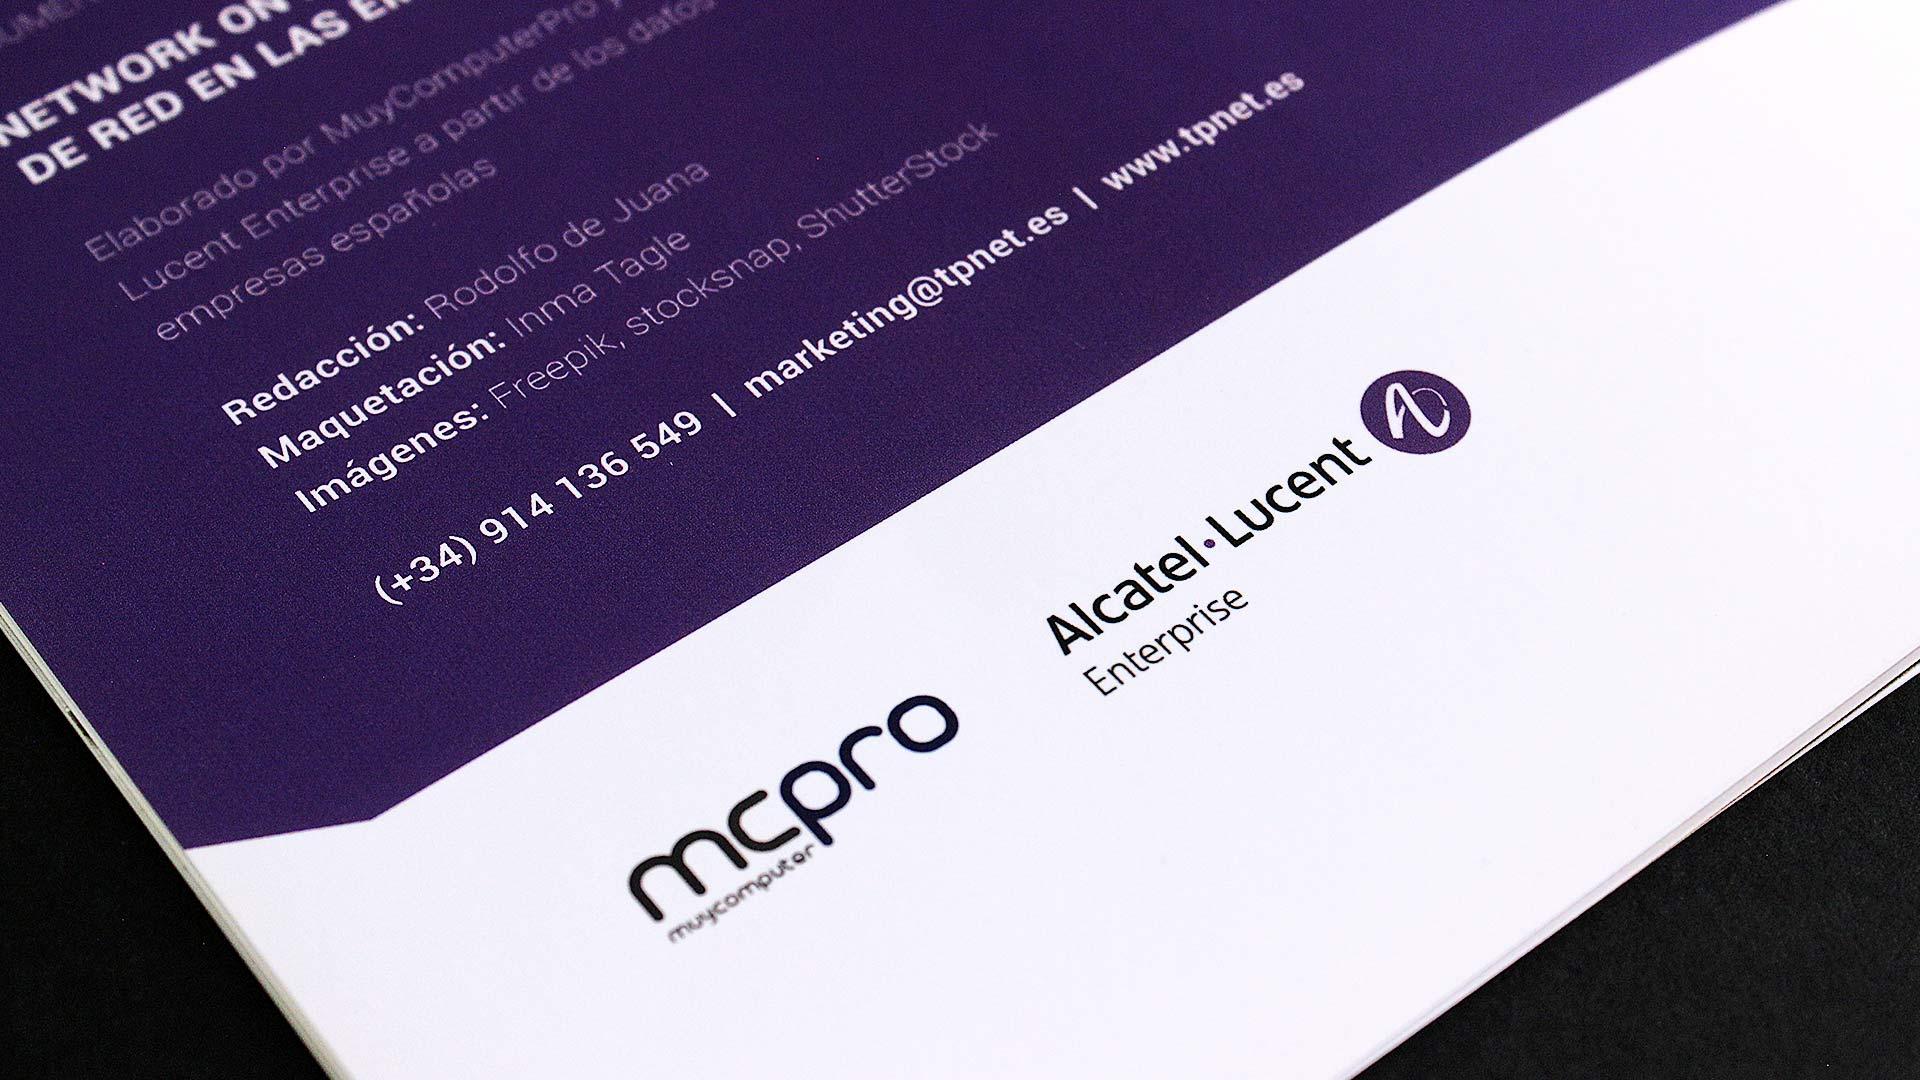 alcatel-content-marketing-informe-resumen-ejecutivo-networkondemand-ebook-2016-25